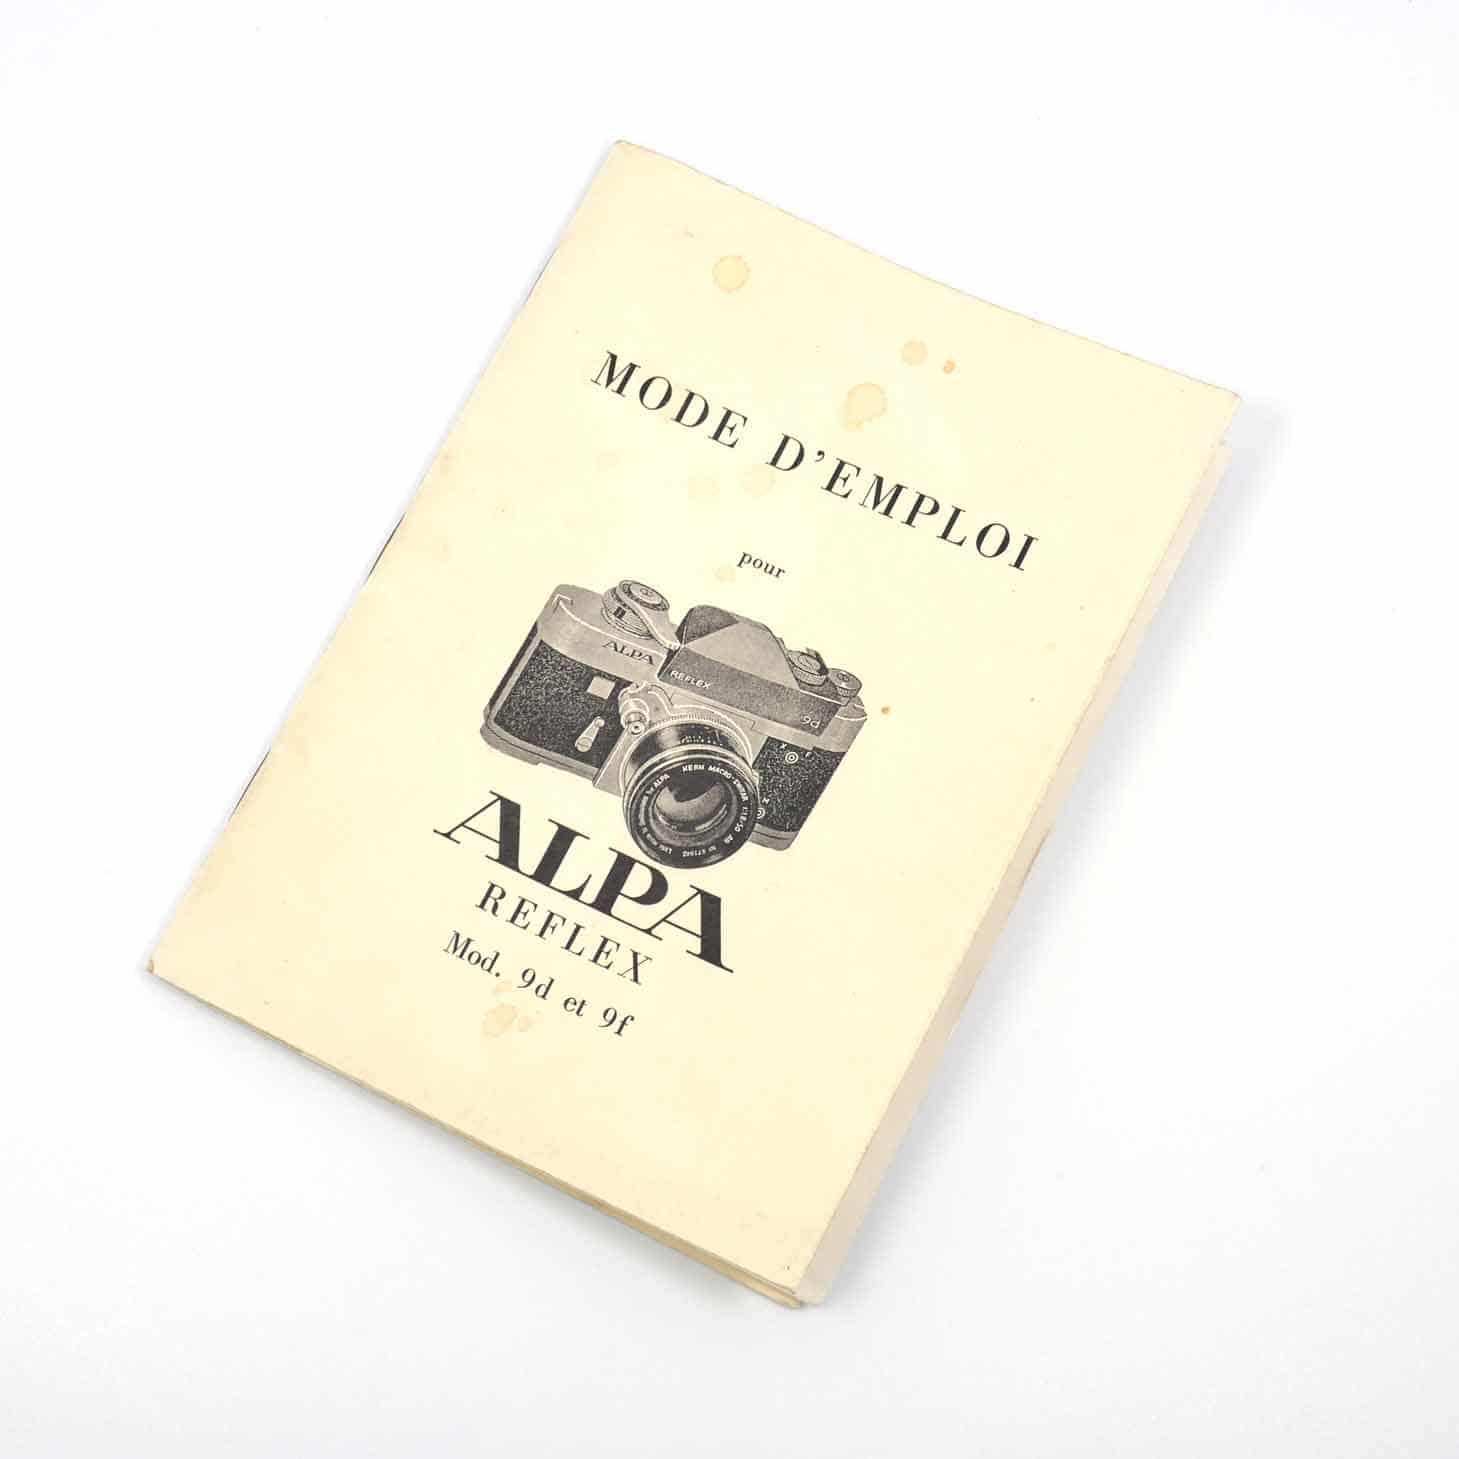 clean-cameras-Alpa-9d-Body-black-02